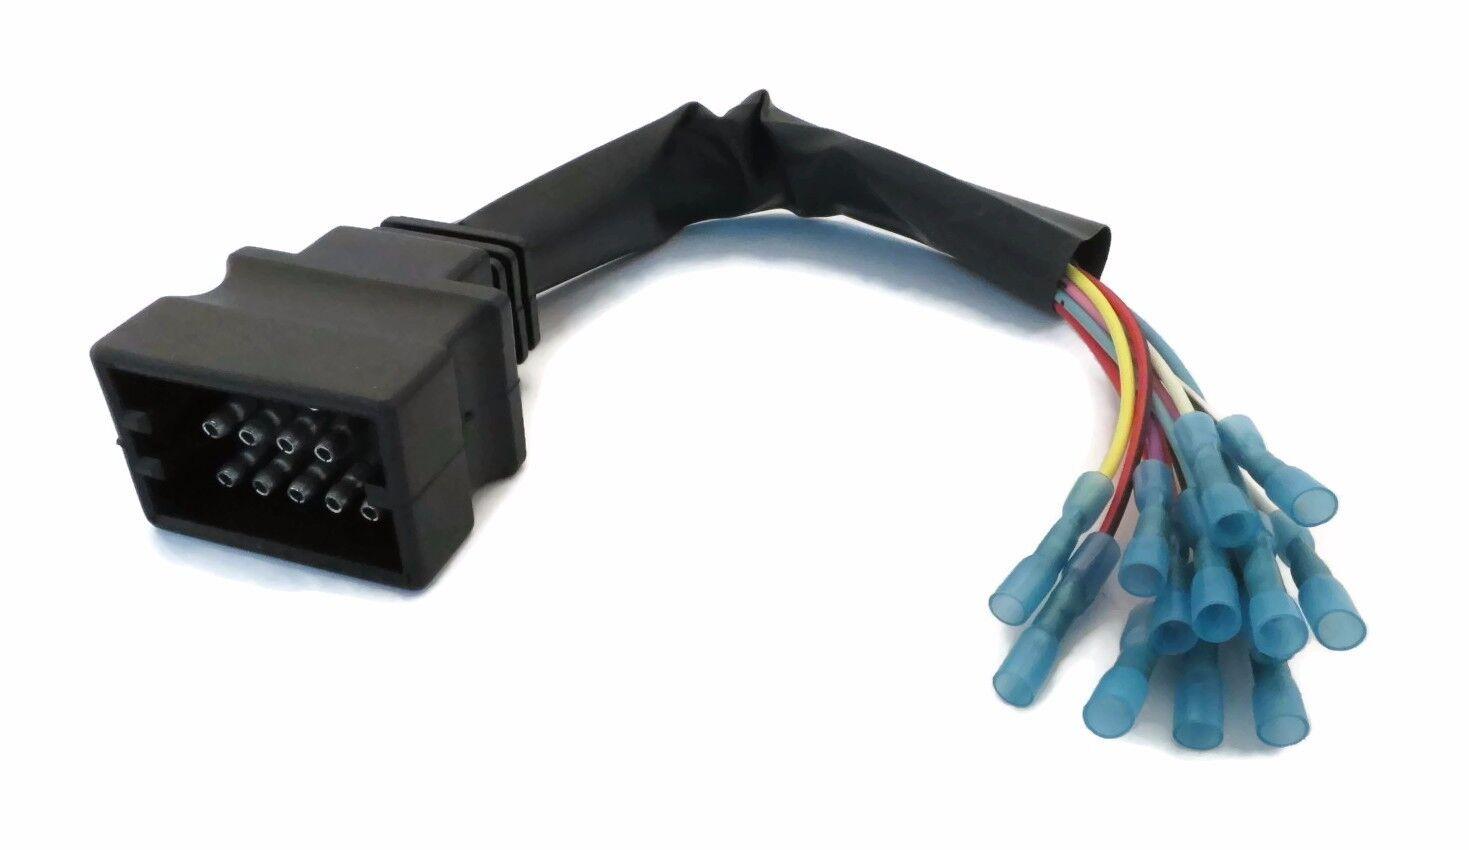 Boss Bv9560b Wiring Harness Diagrams Extension Cord Plug Diagram Todays Rebel